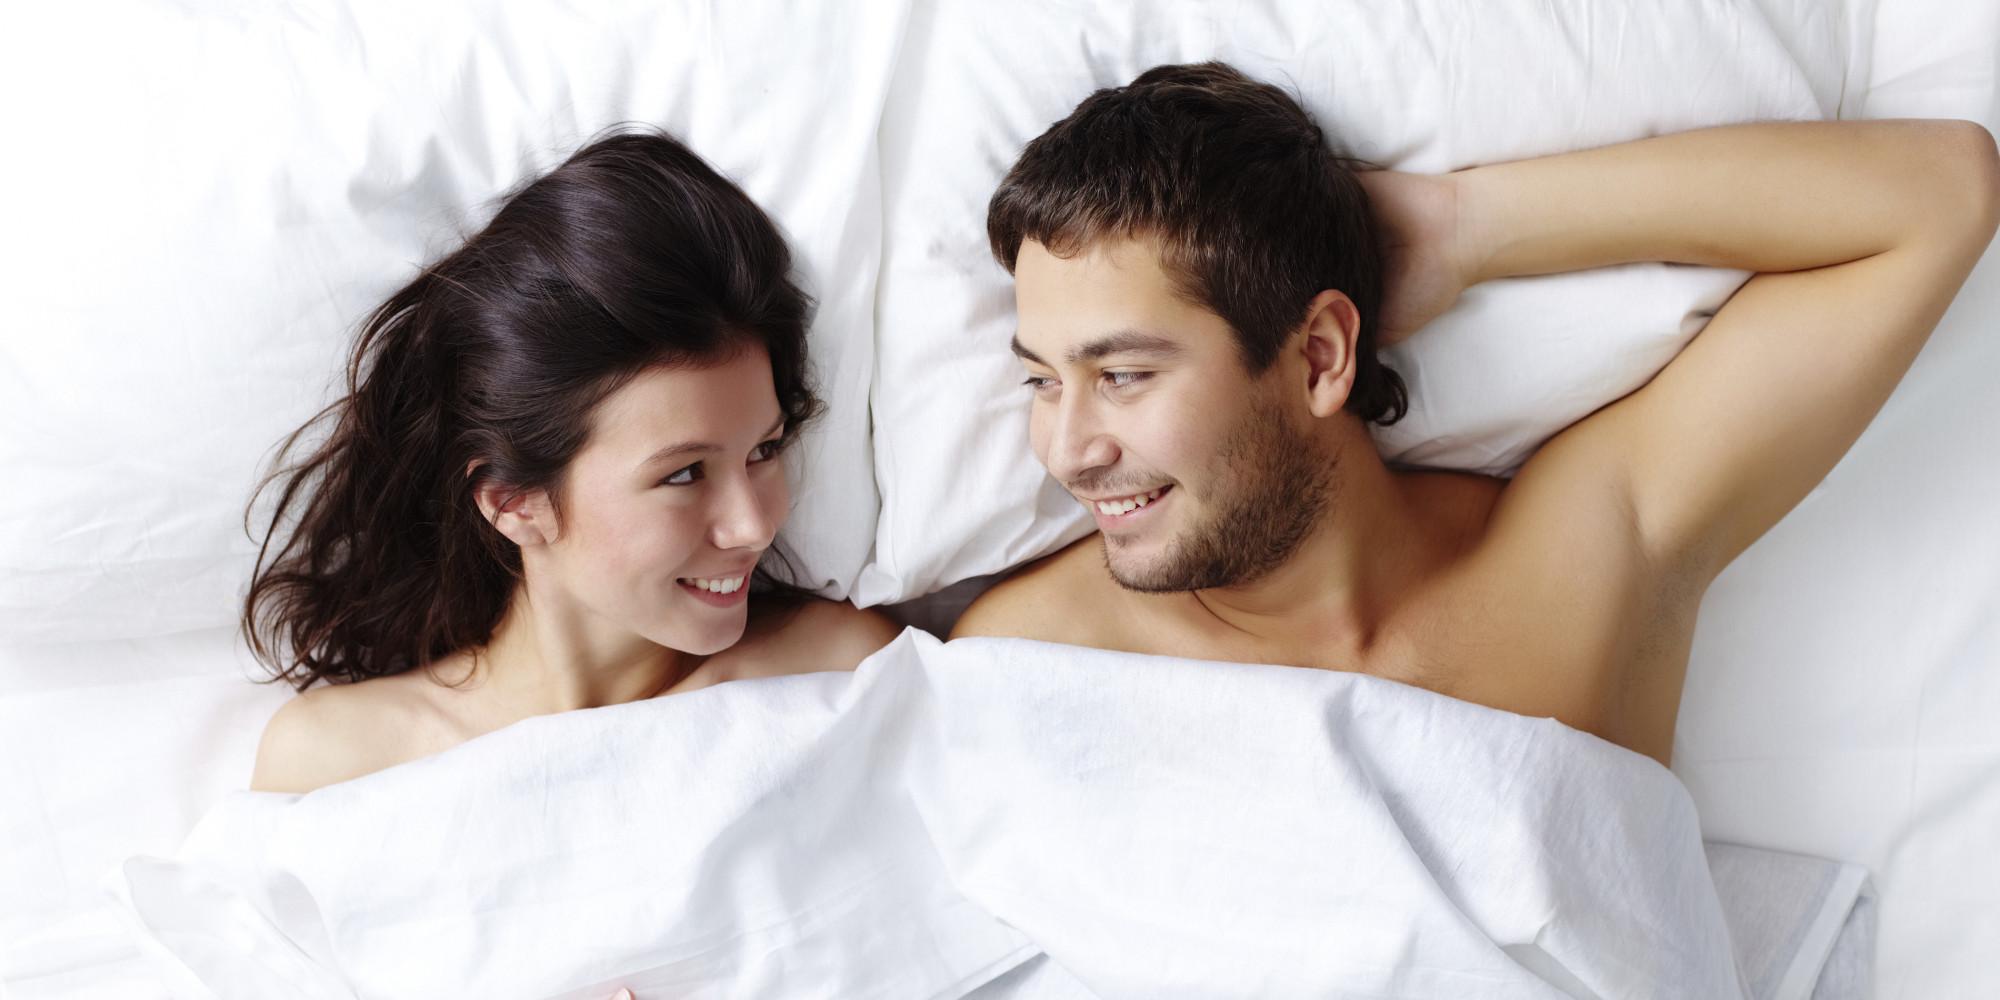 tag sie will sex